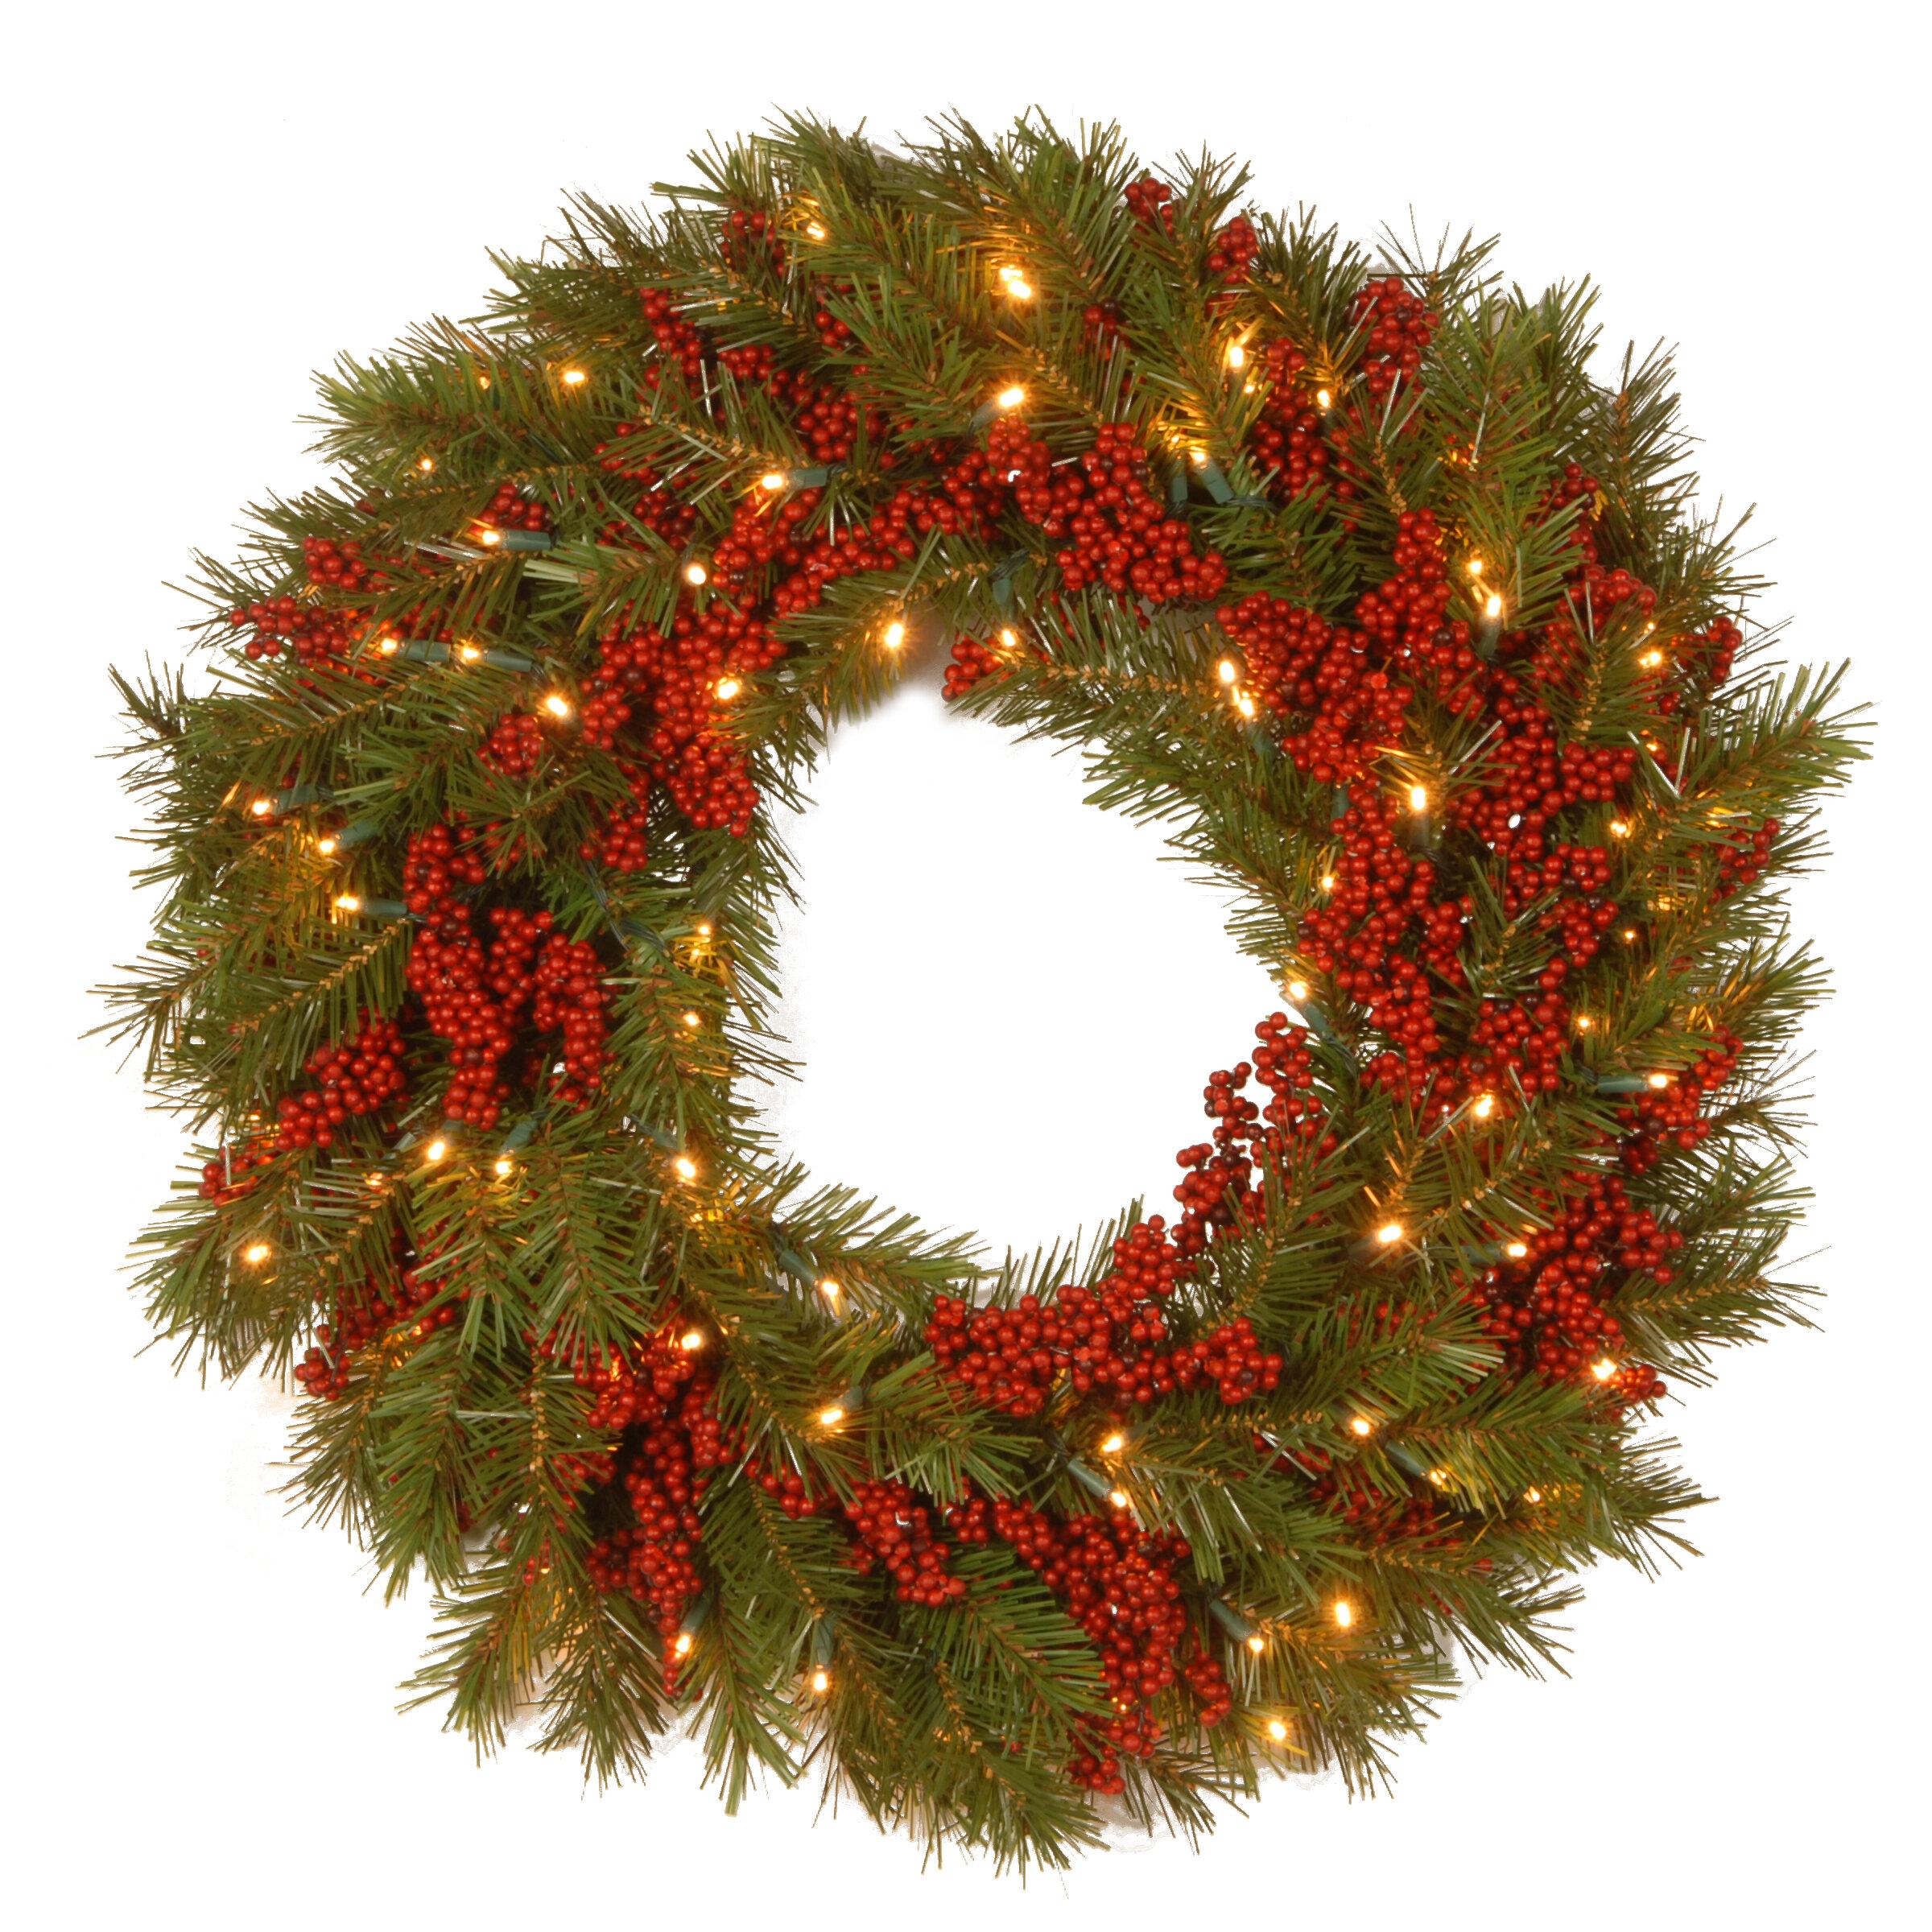 Decorative Pre Lit Valley Pine Wreath